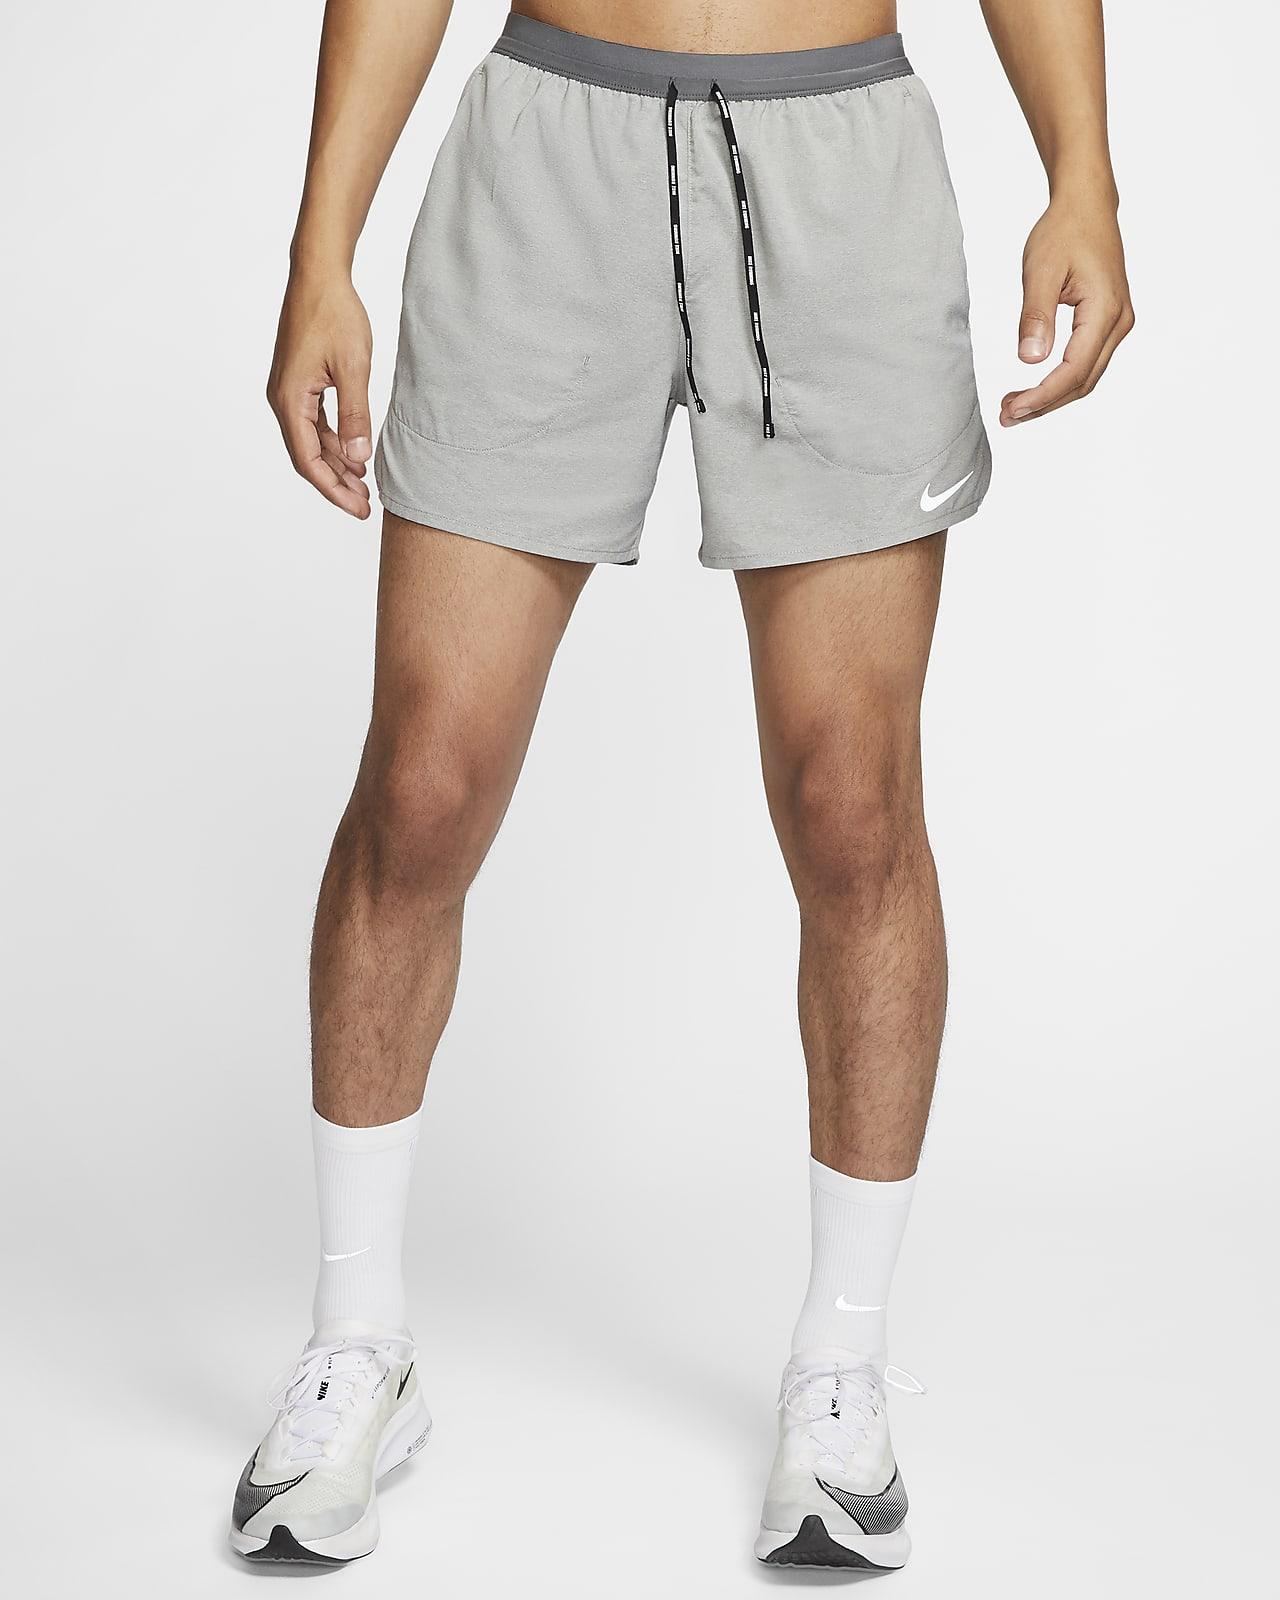 Shorts de running de 13 cm para hombre Nike Flex Stride